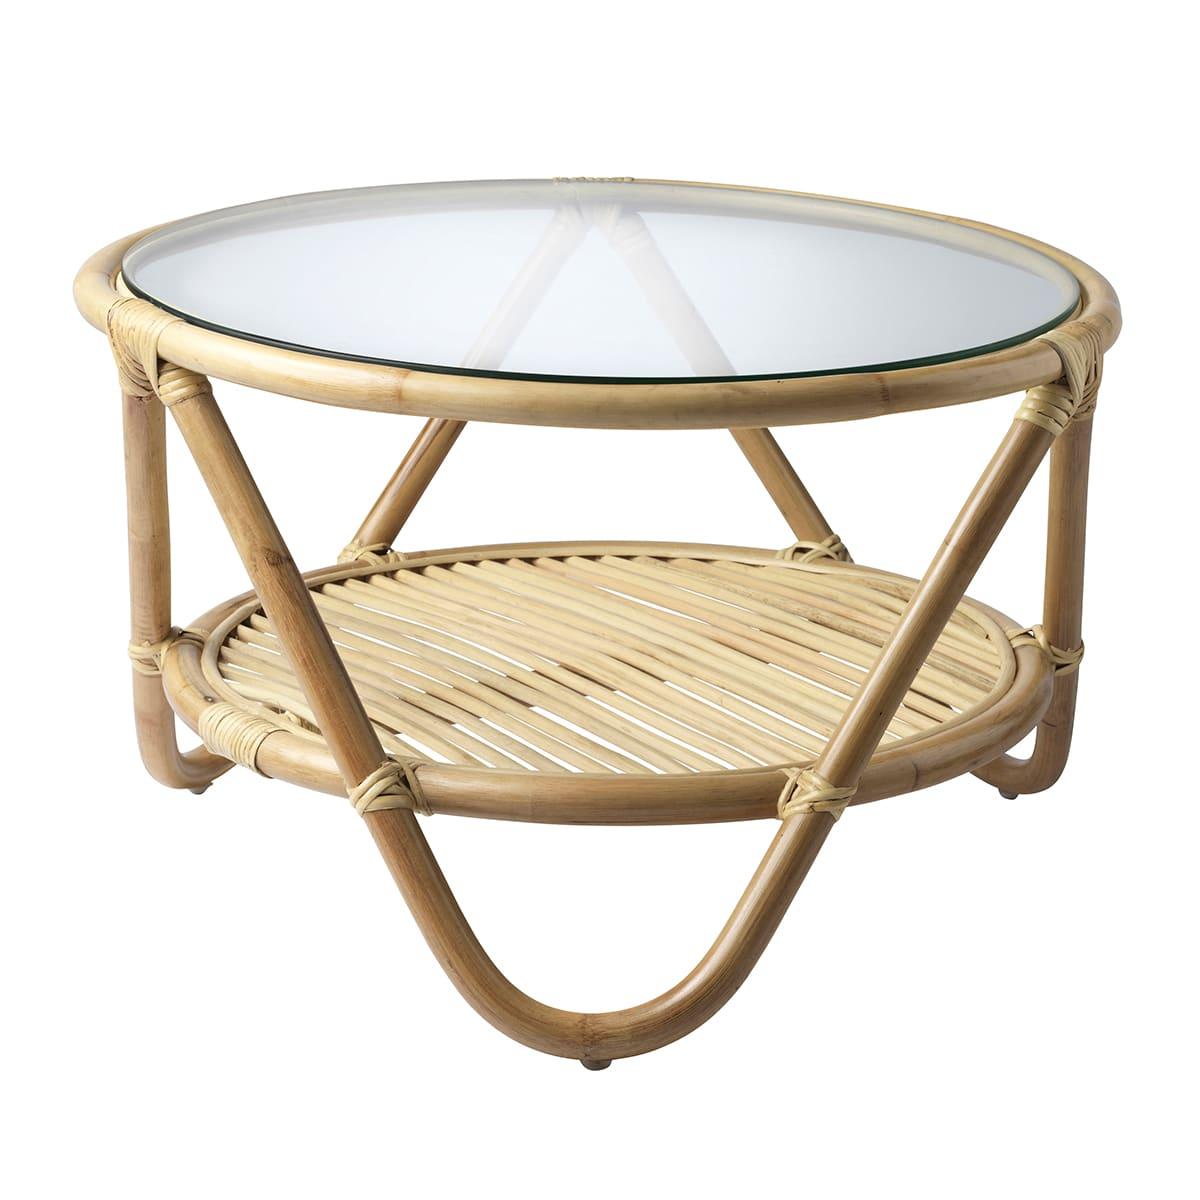 Ø 65 cm - Lavet i dekorativt rattan